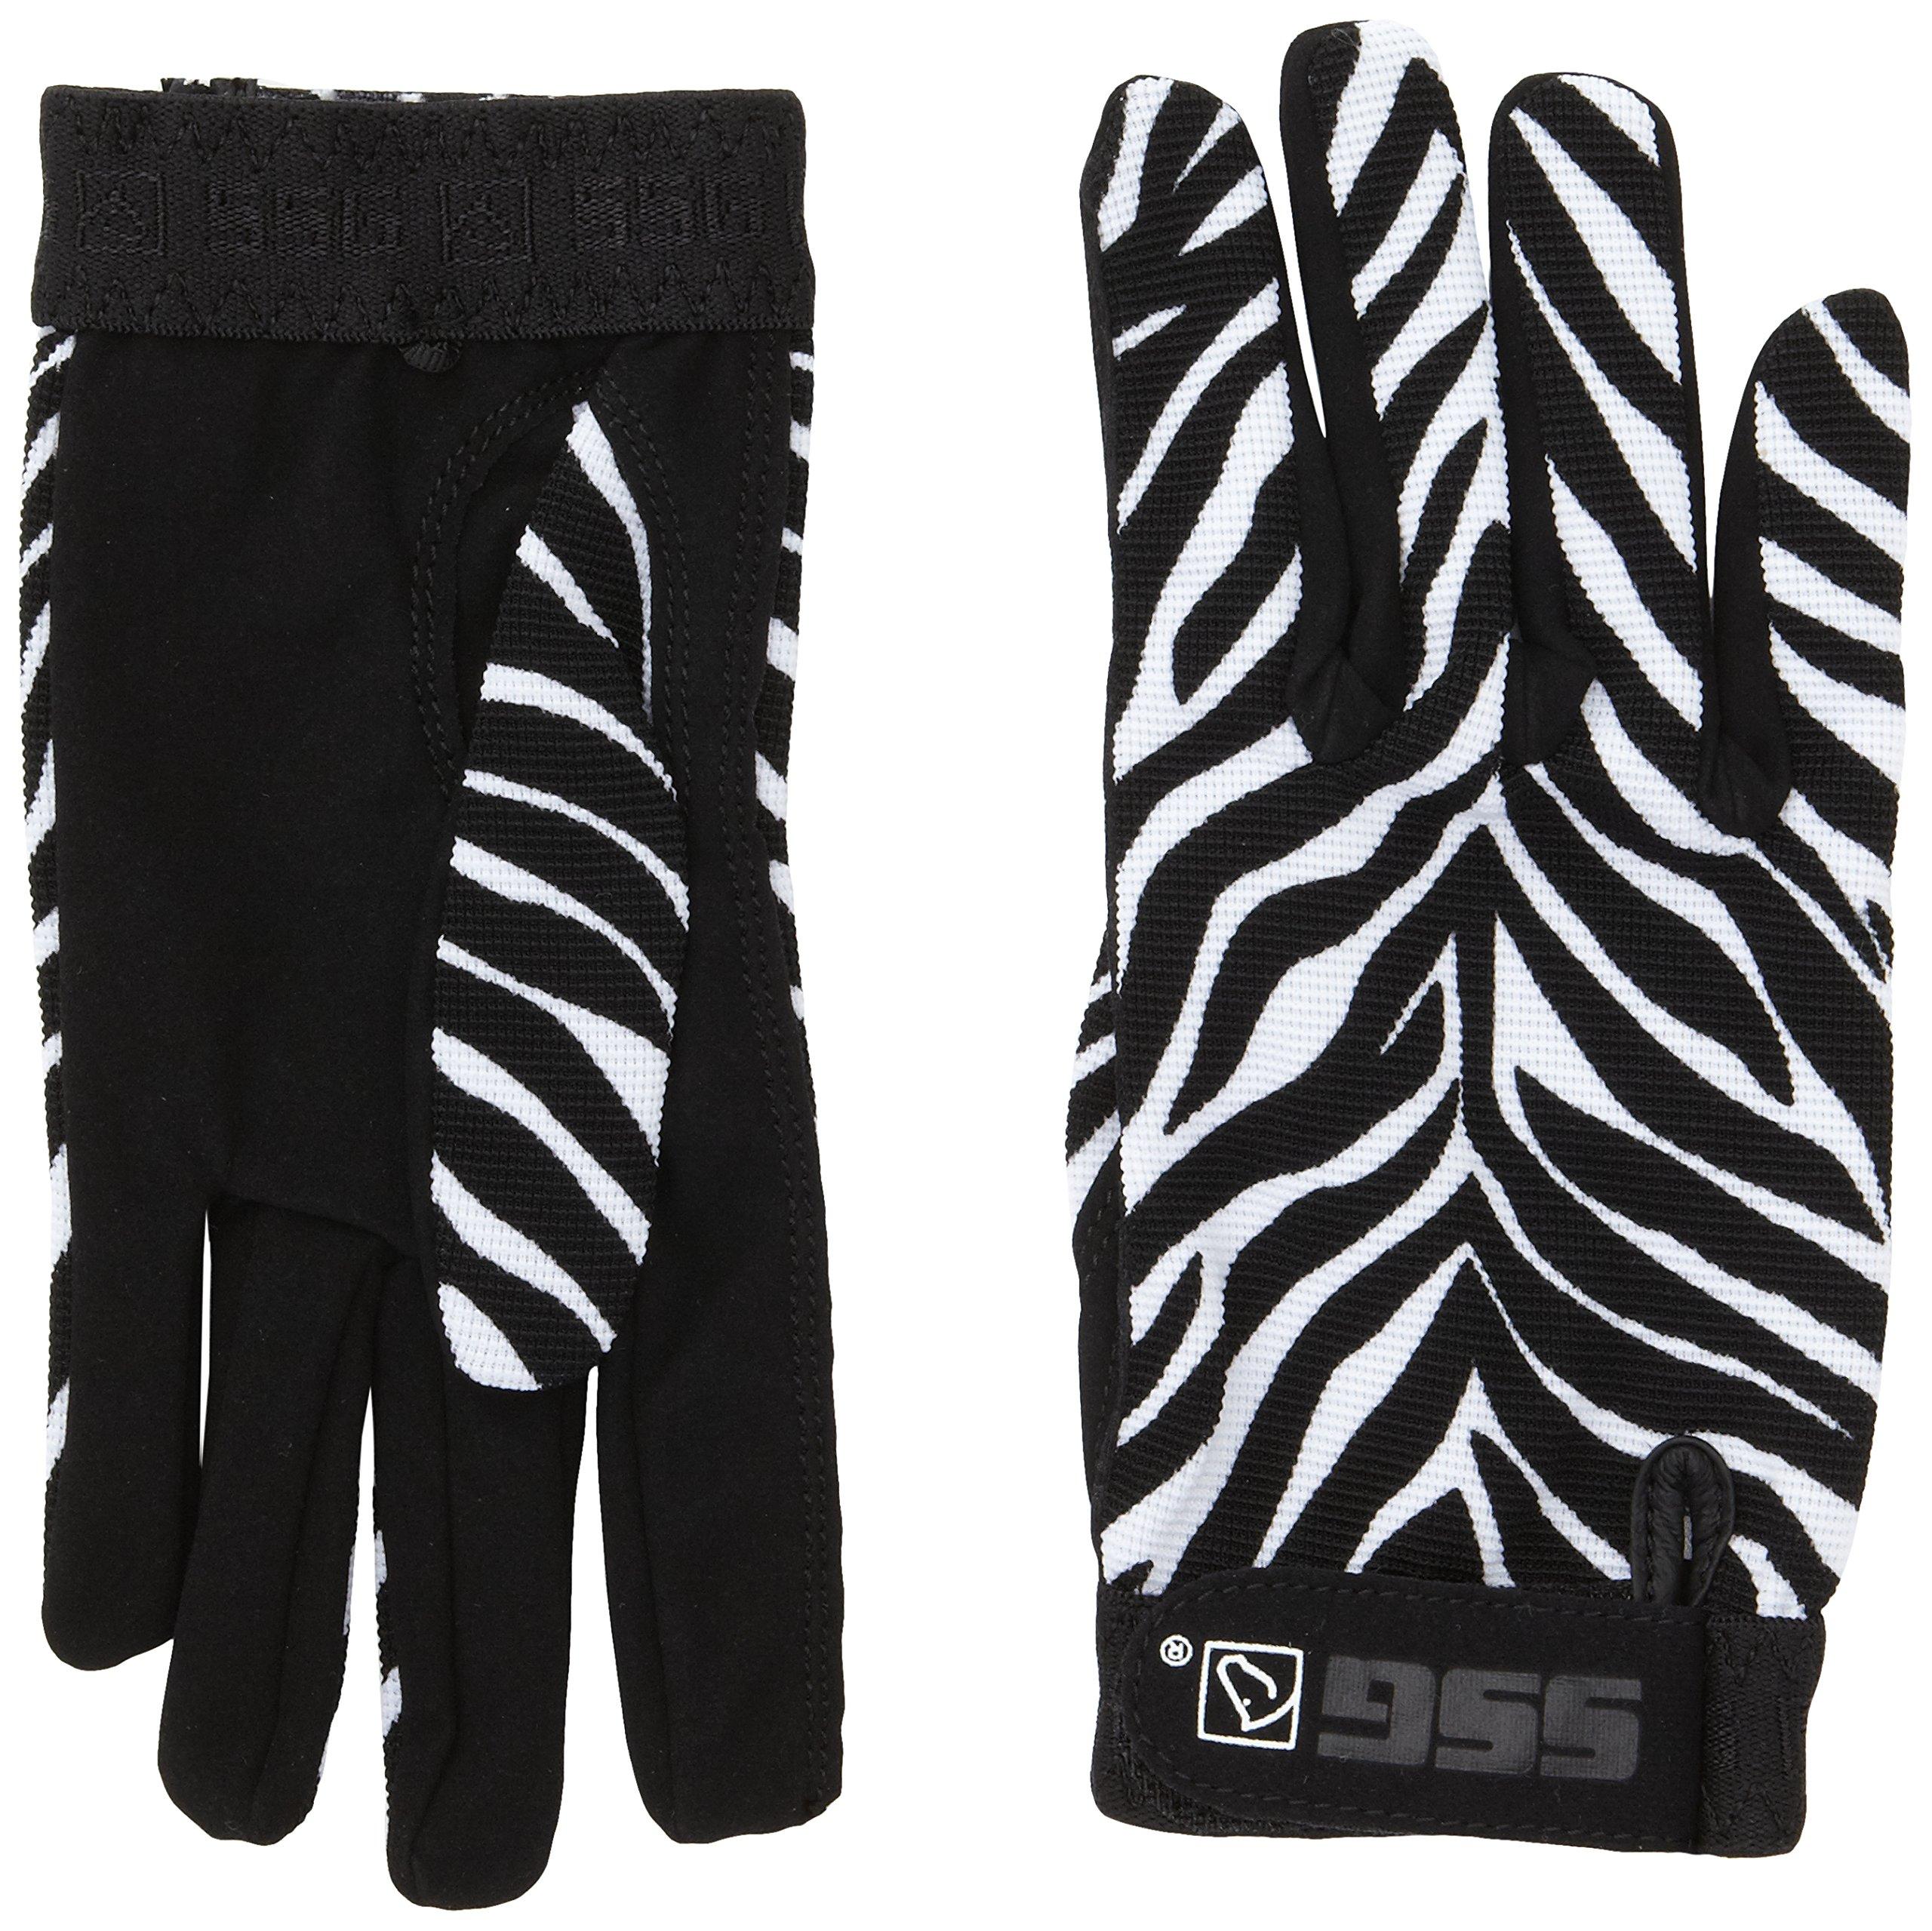 SSG Ladies' All Weather Gloves - Zebra by SSG